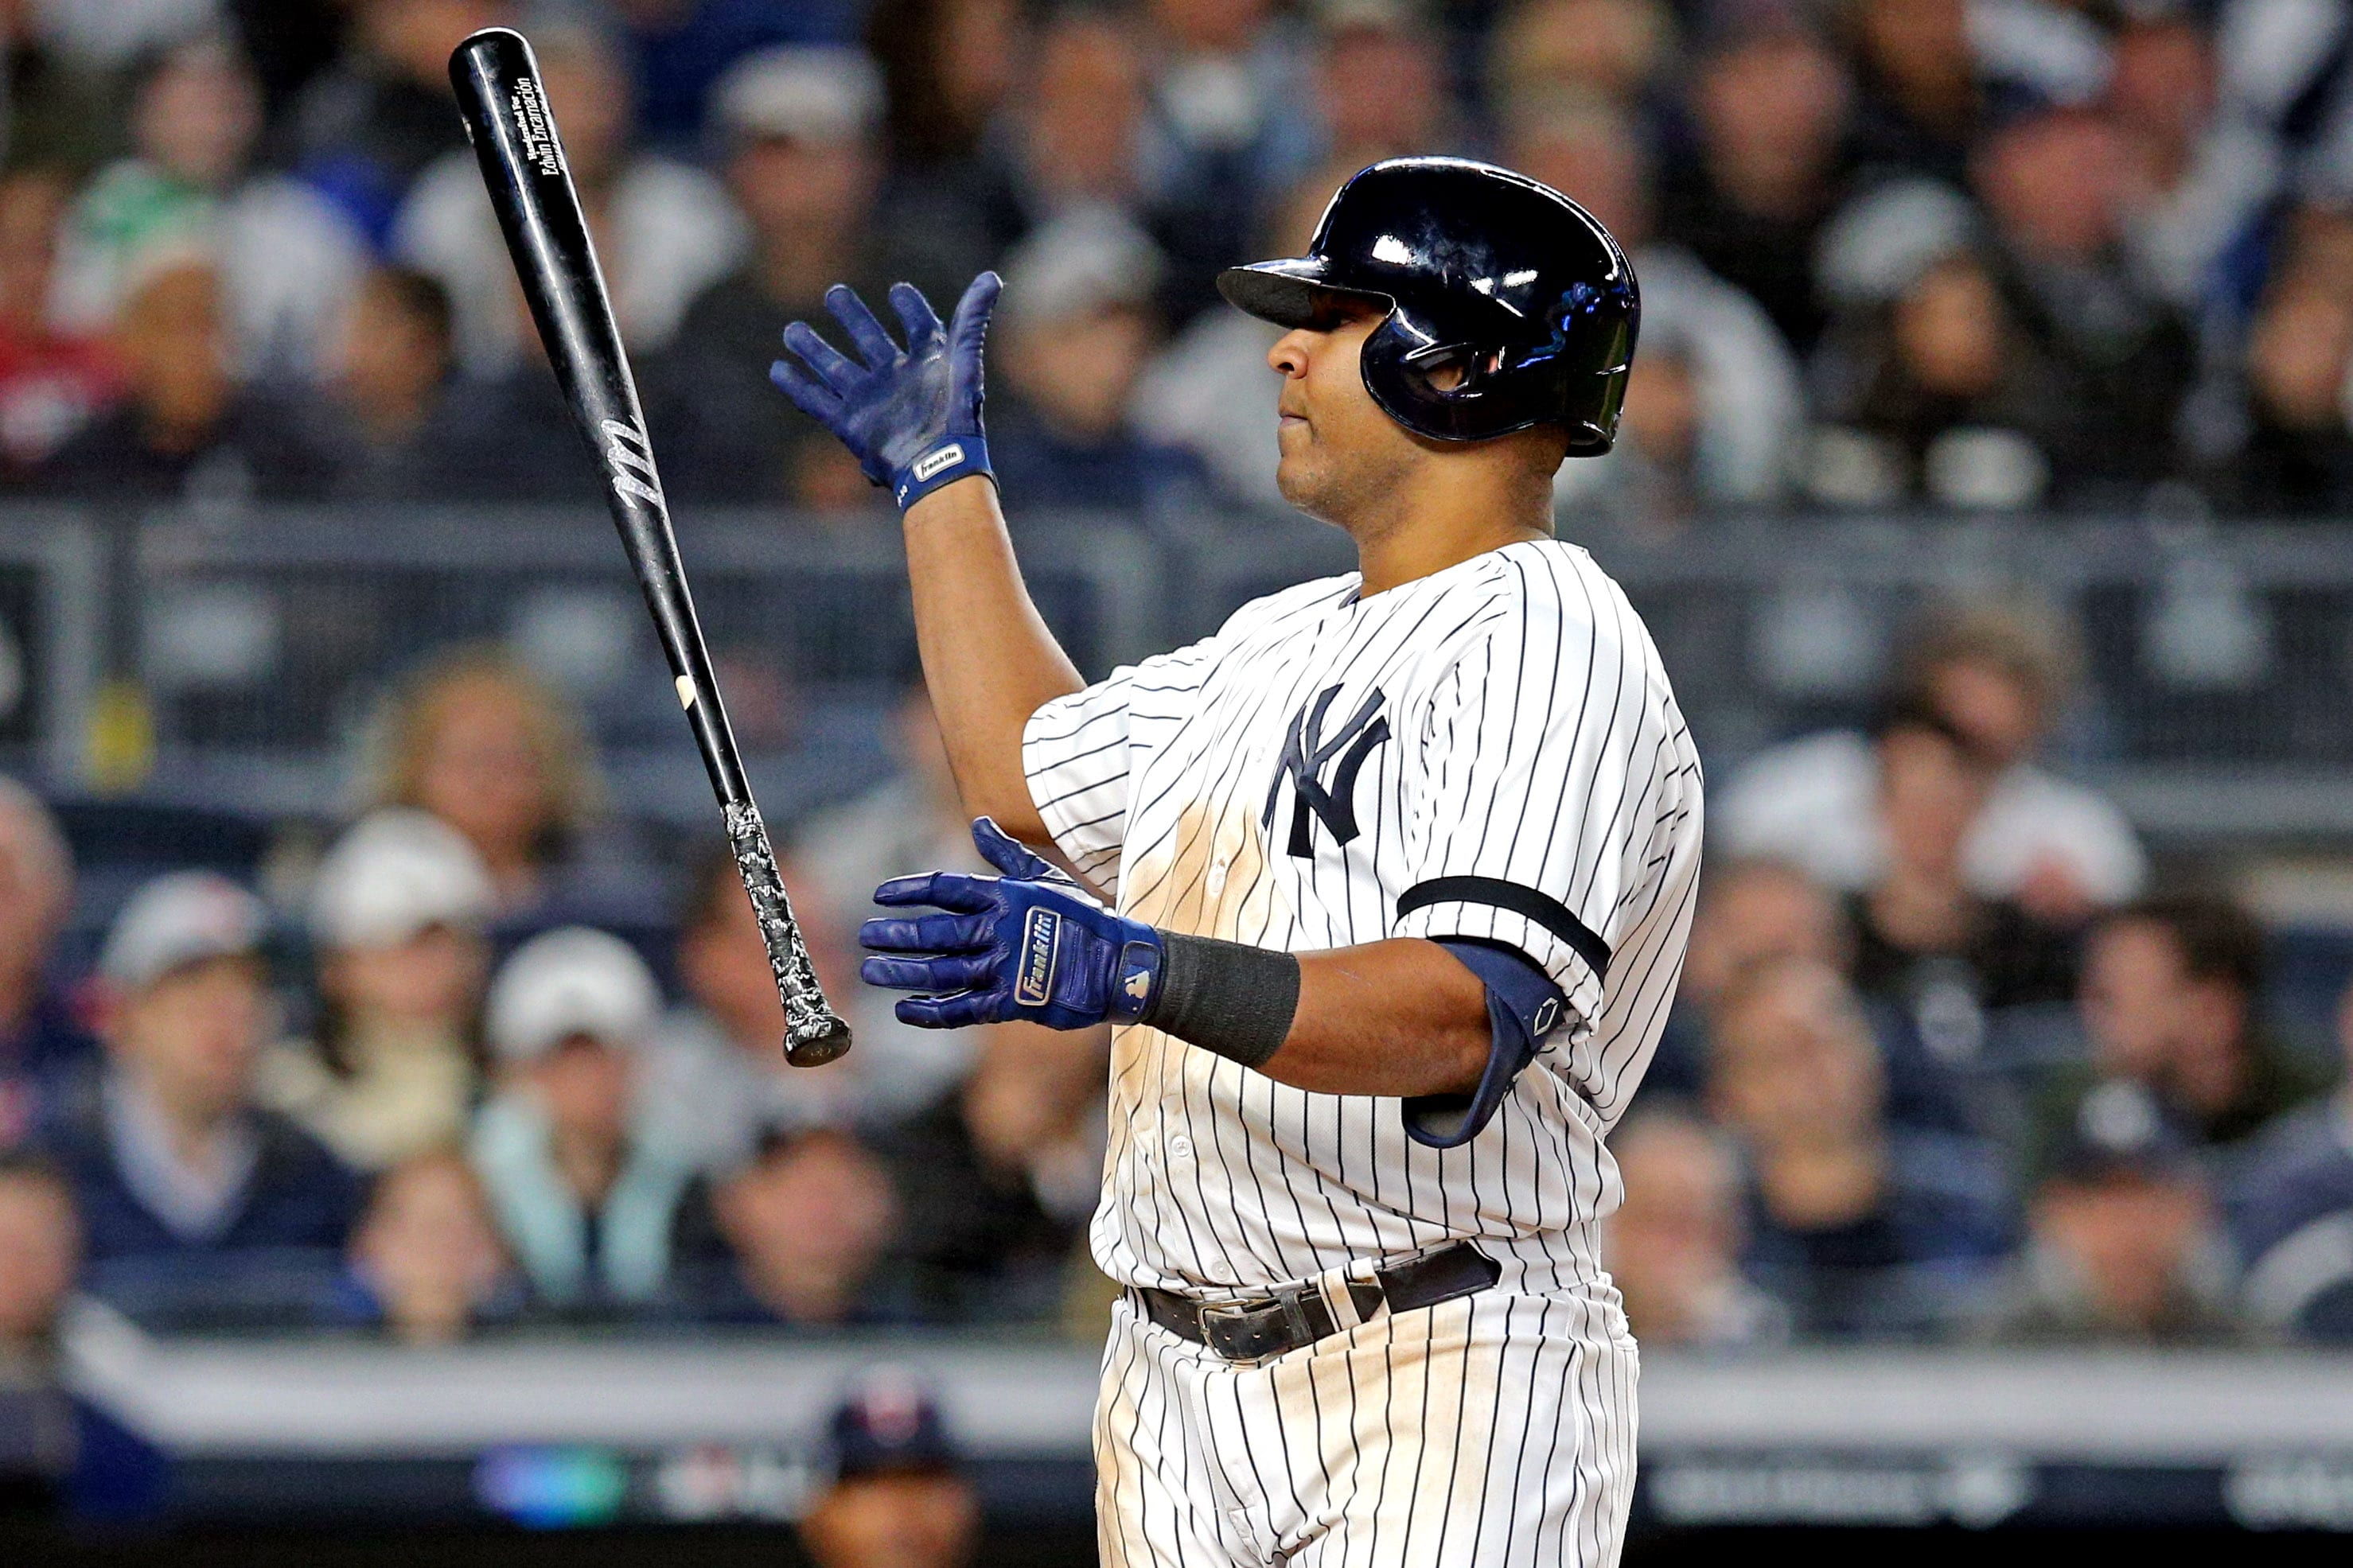 New York Yankees, Edwin Encarnacion